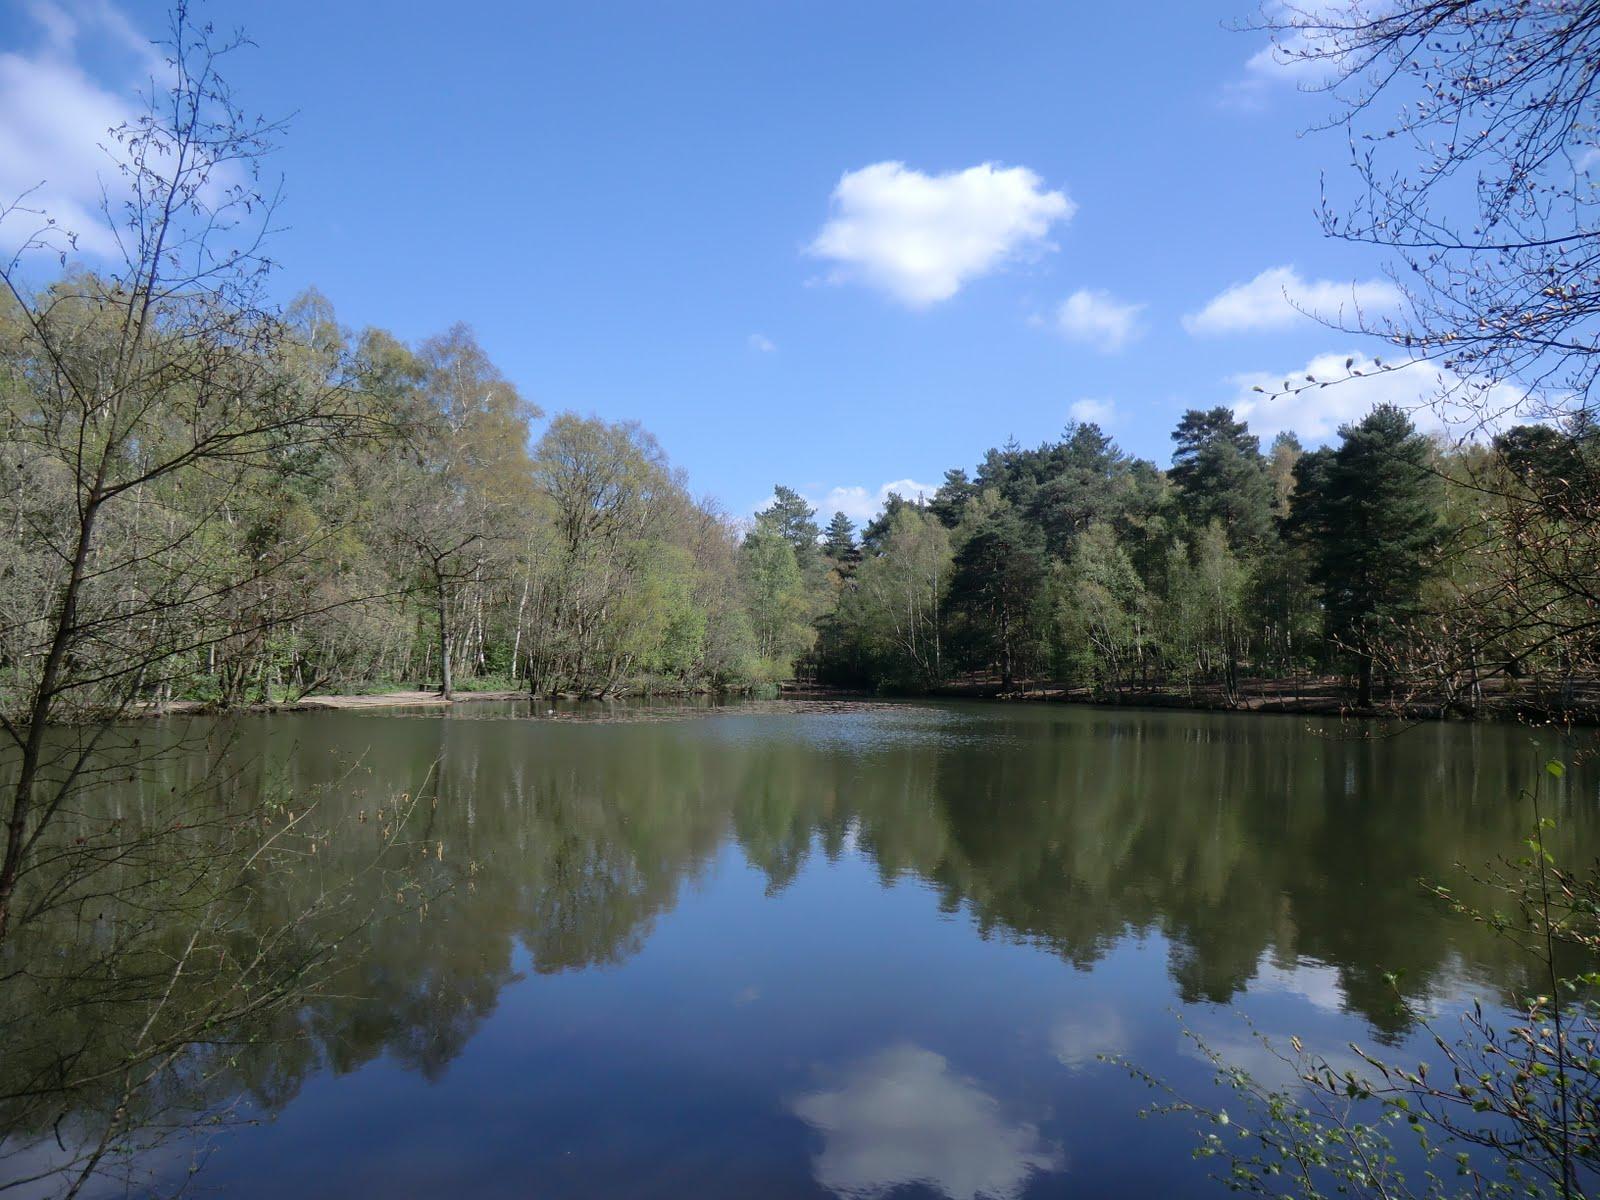 CIMG0448 Heath Pond in spring